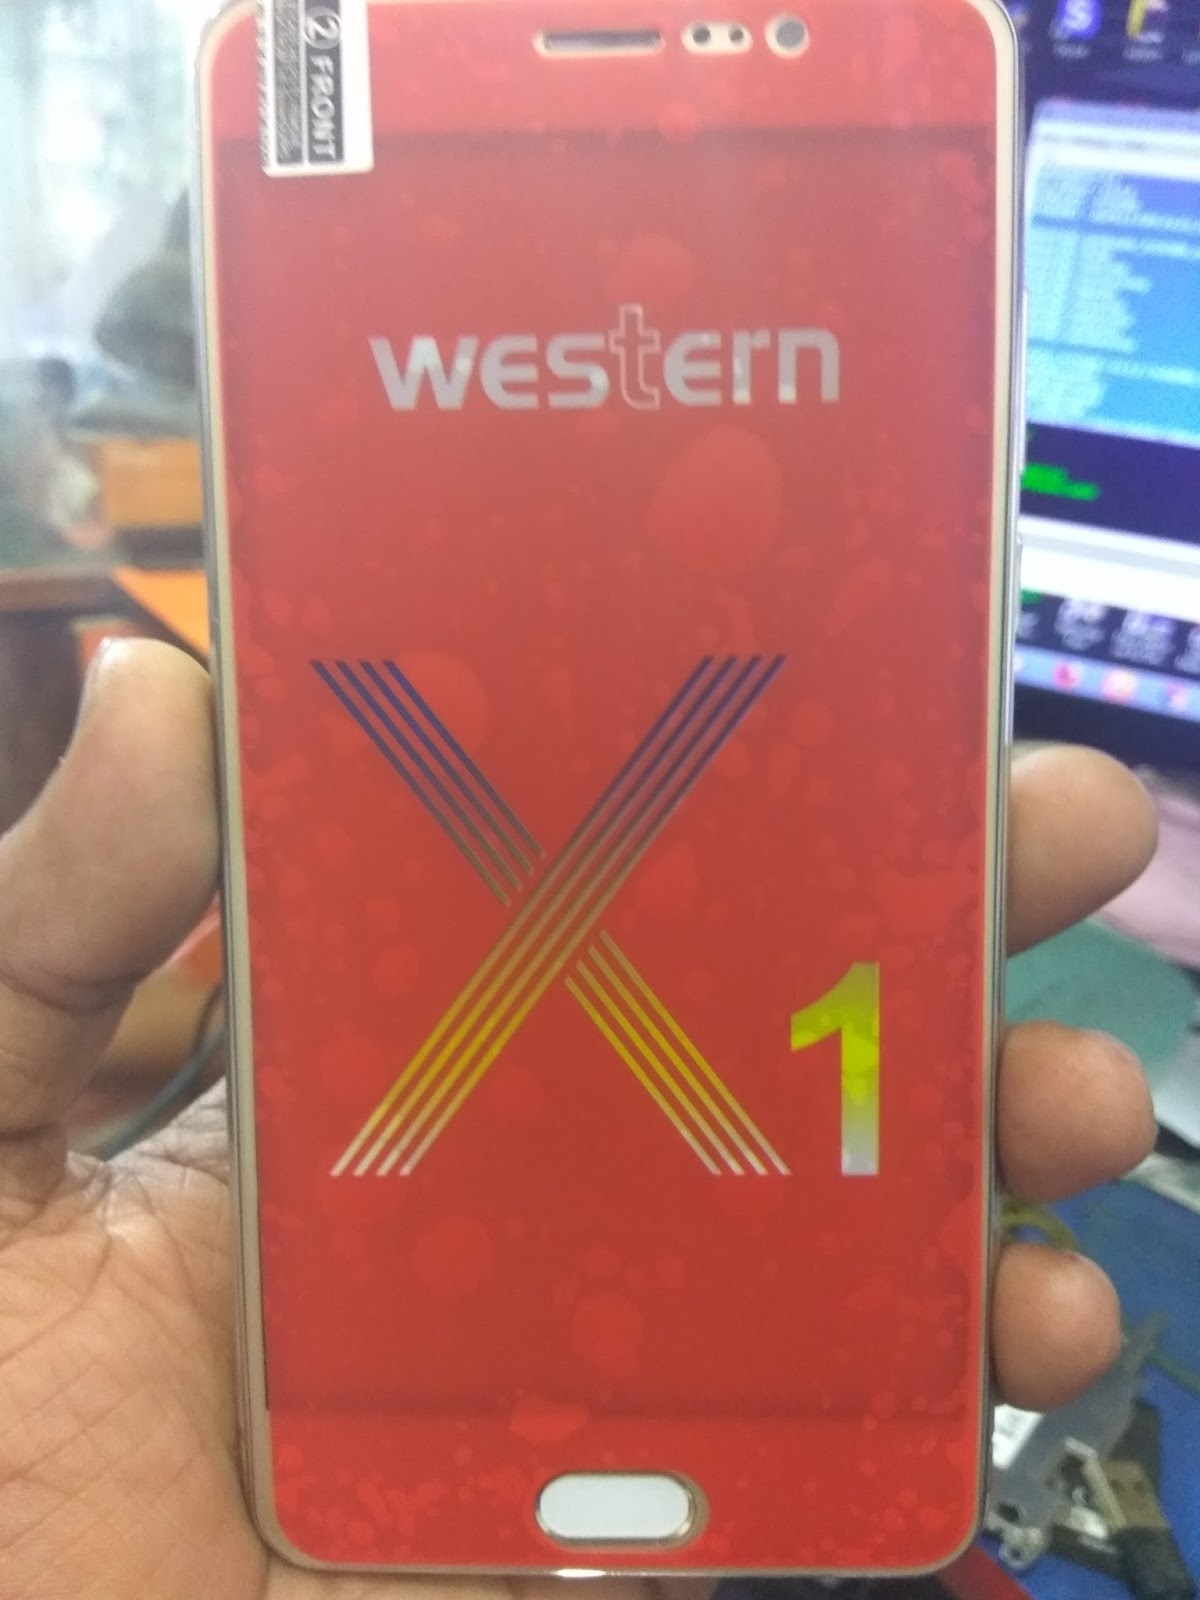 western x1 flash file MT6580 V5 1 BIN file Tested by Rehan Tele